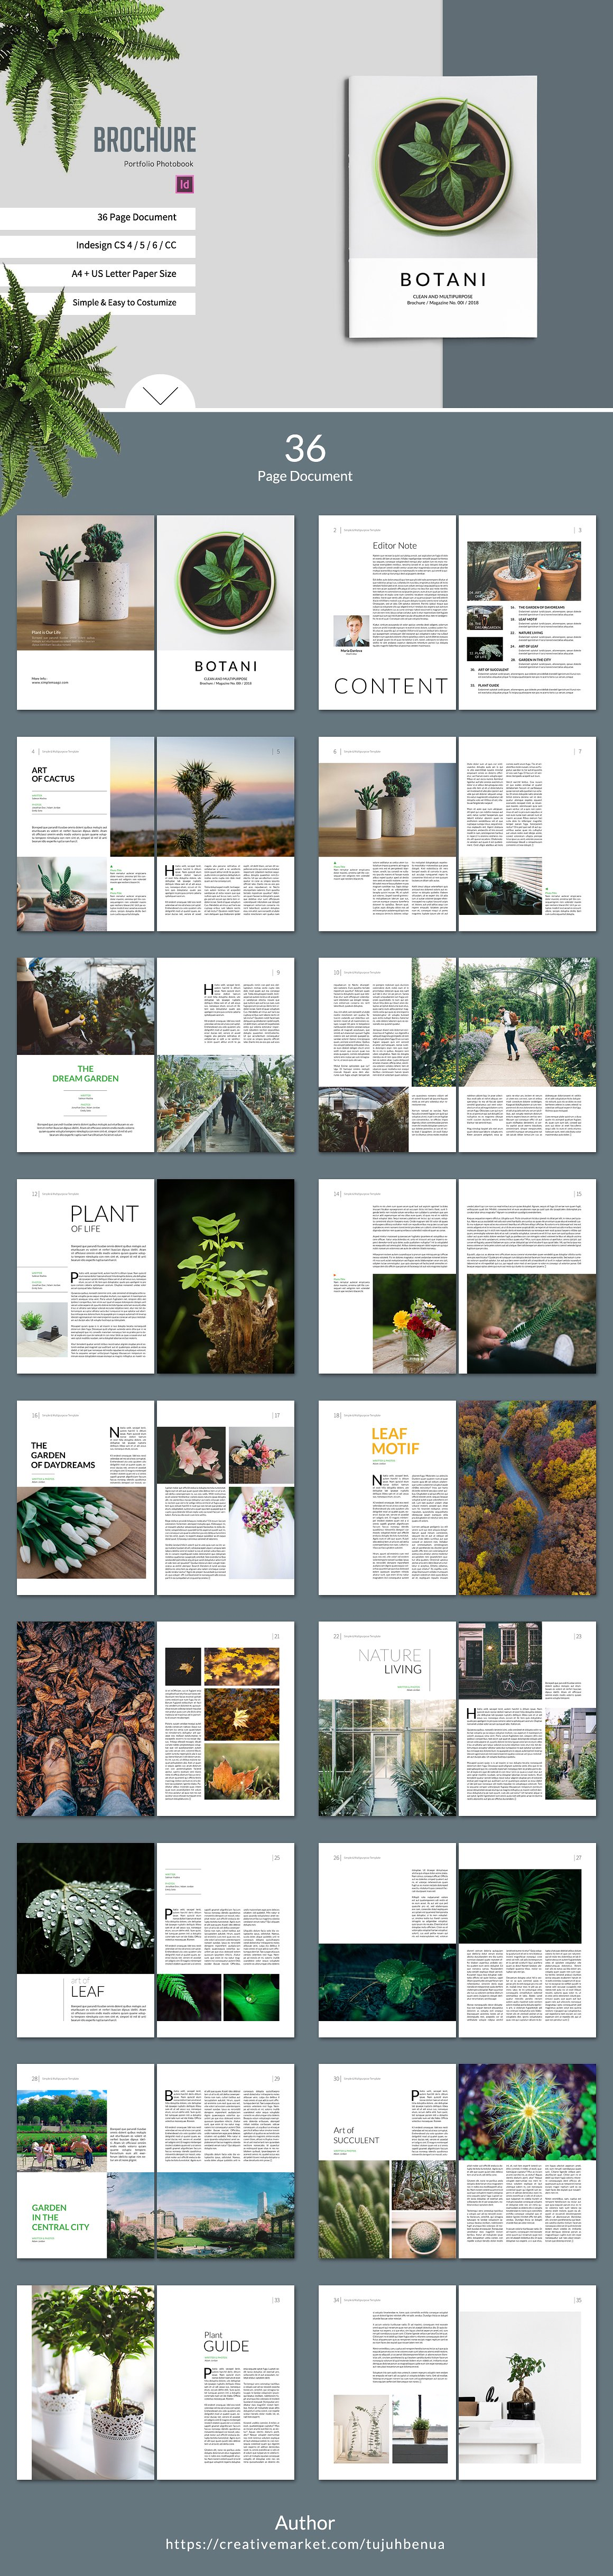 Botani LookbookMagazine  Brochures Photobook Template